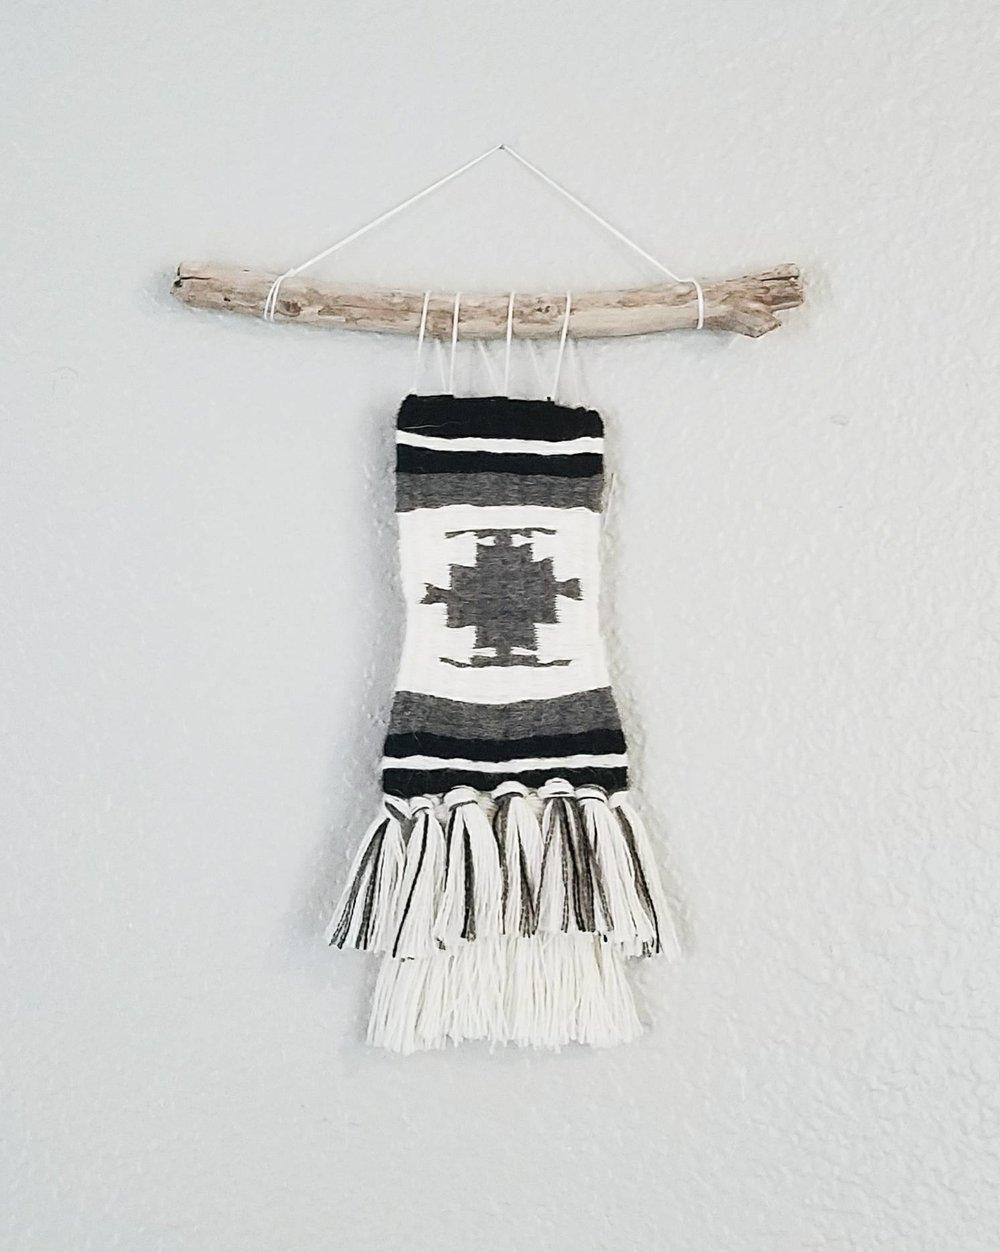 Catacos Mini-Weaving - The Homely Alpaca